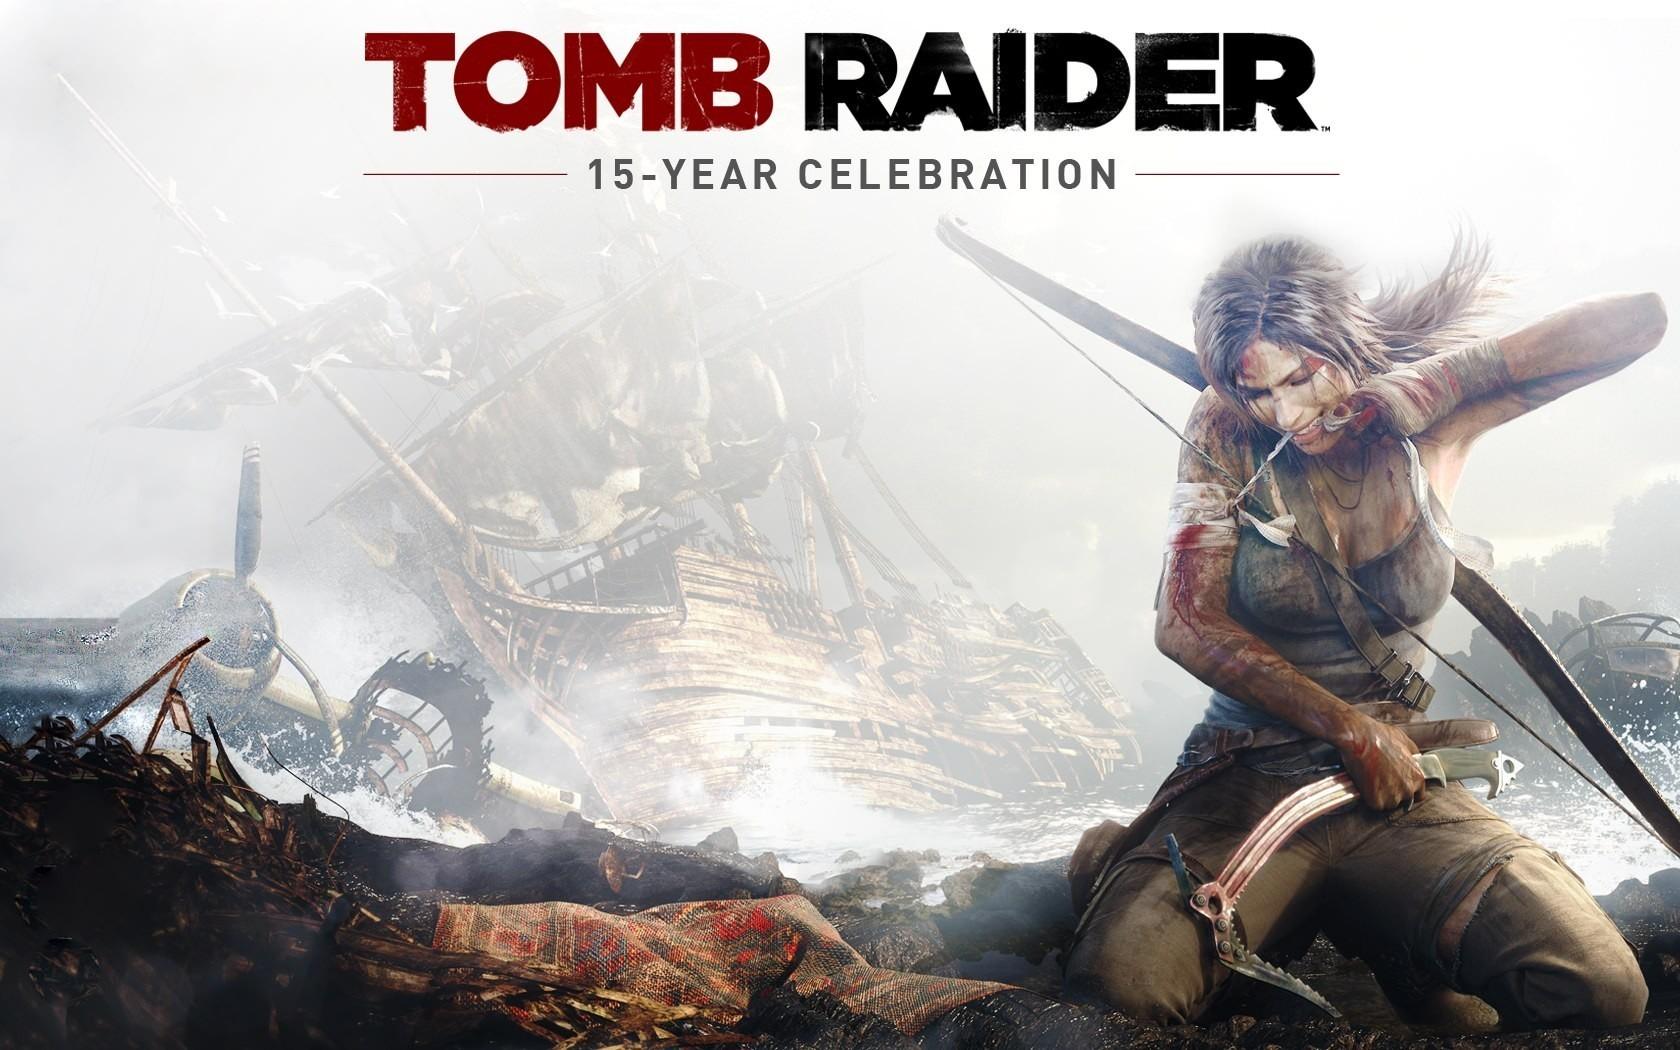 Tomb Raider 2013 Wallpaper Hd Fond D 233 Cran Du Jeu Tomb Raider 1680x1050 398659